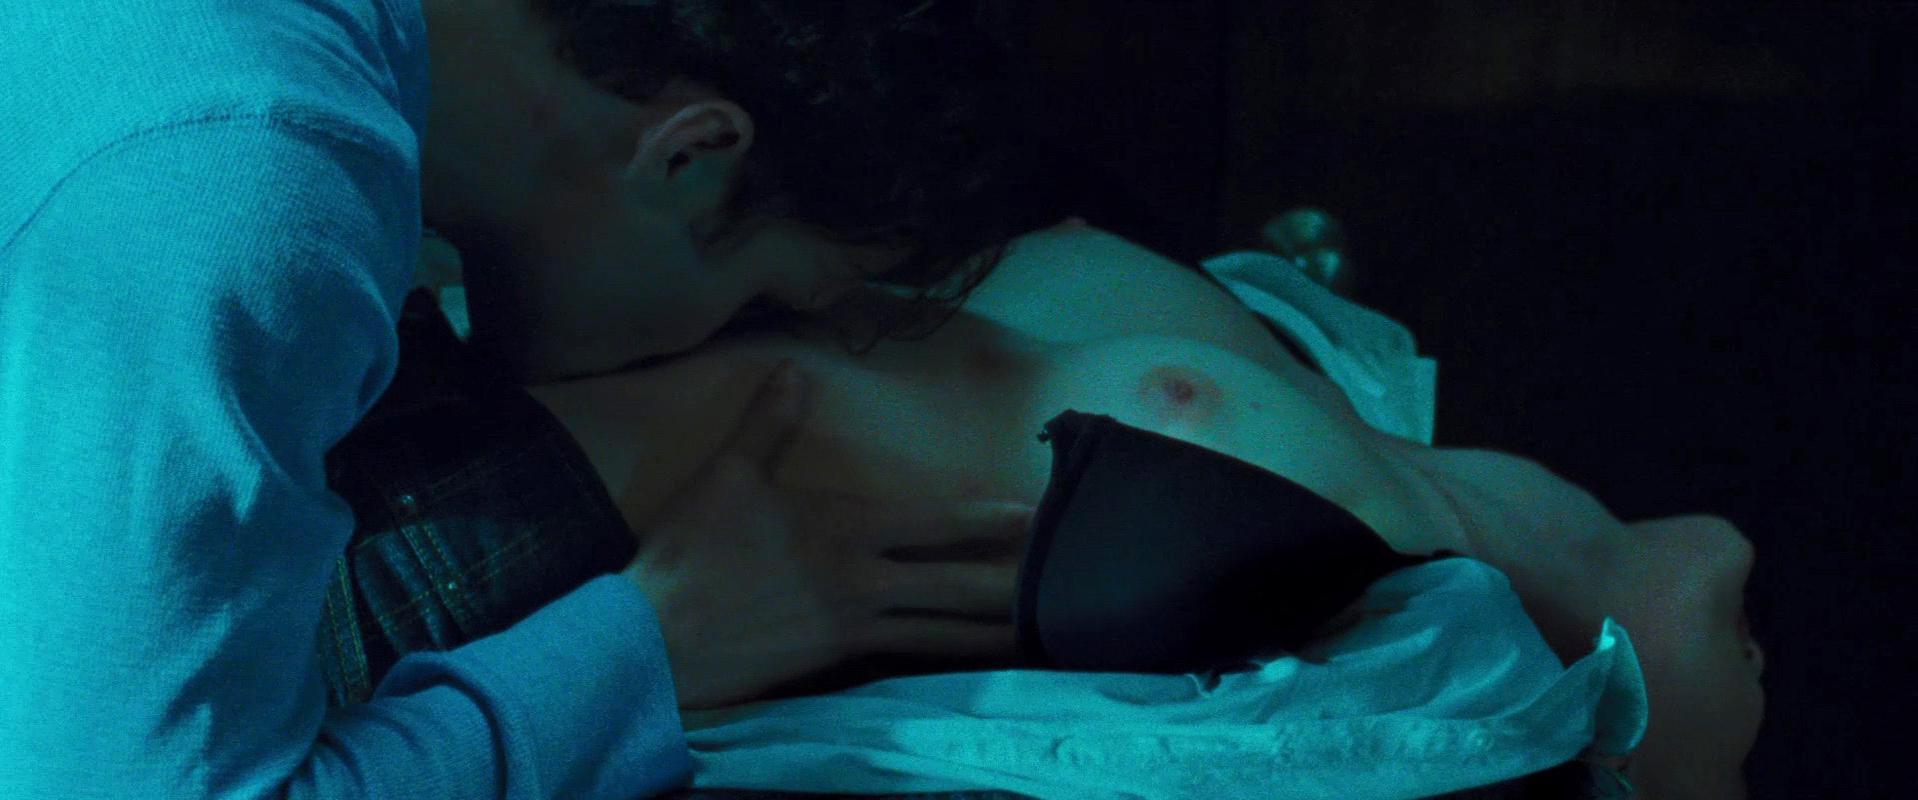 sex video zima clip Madeline